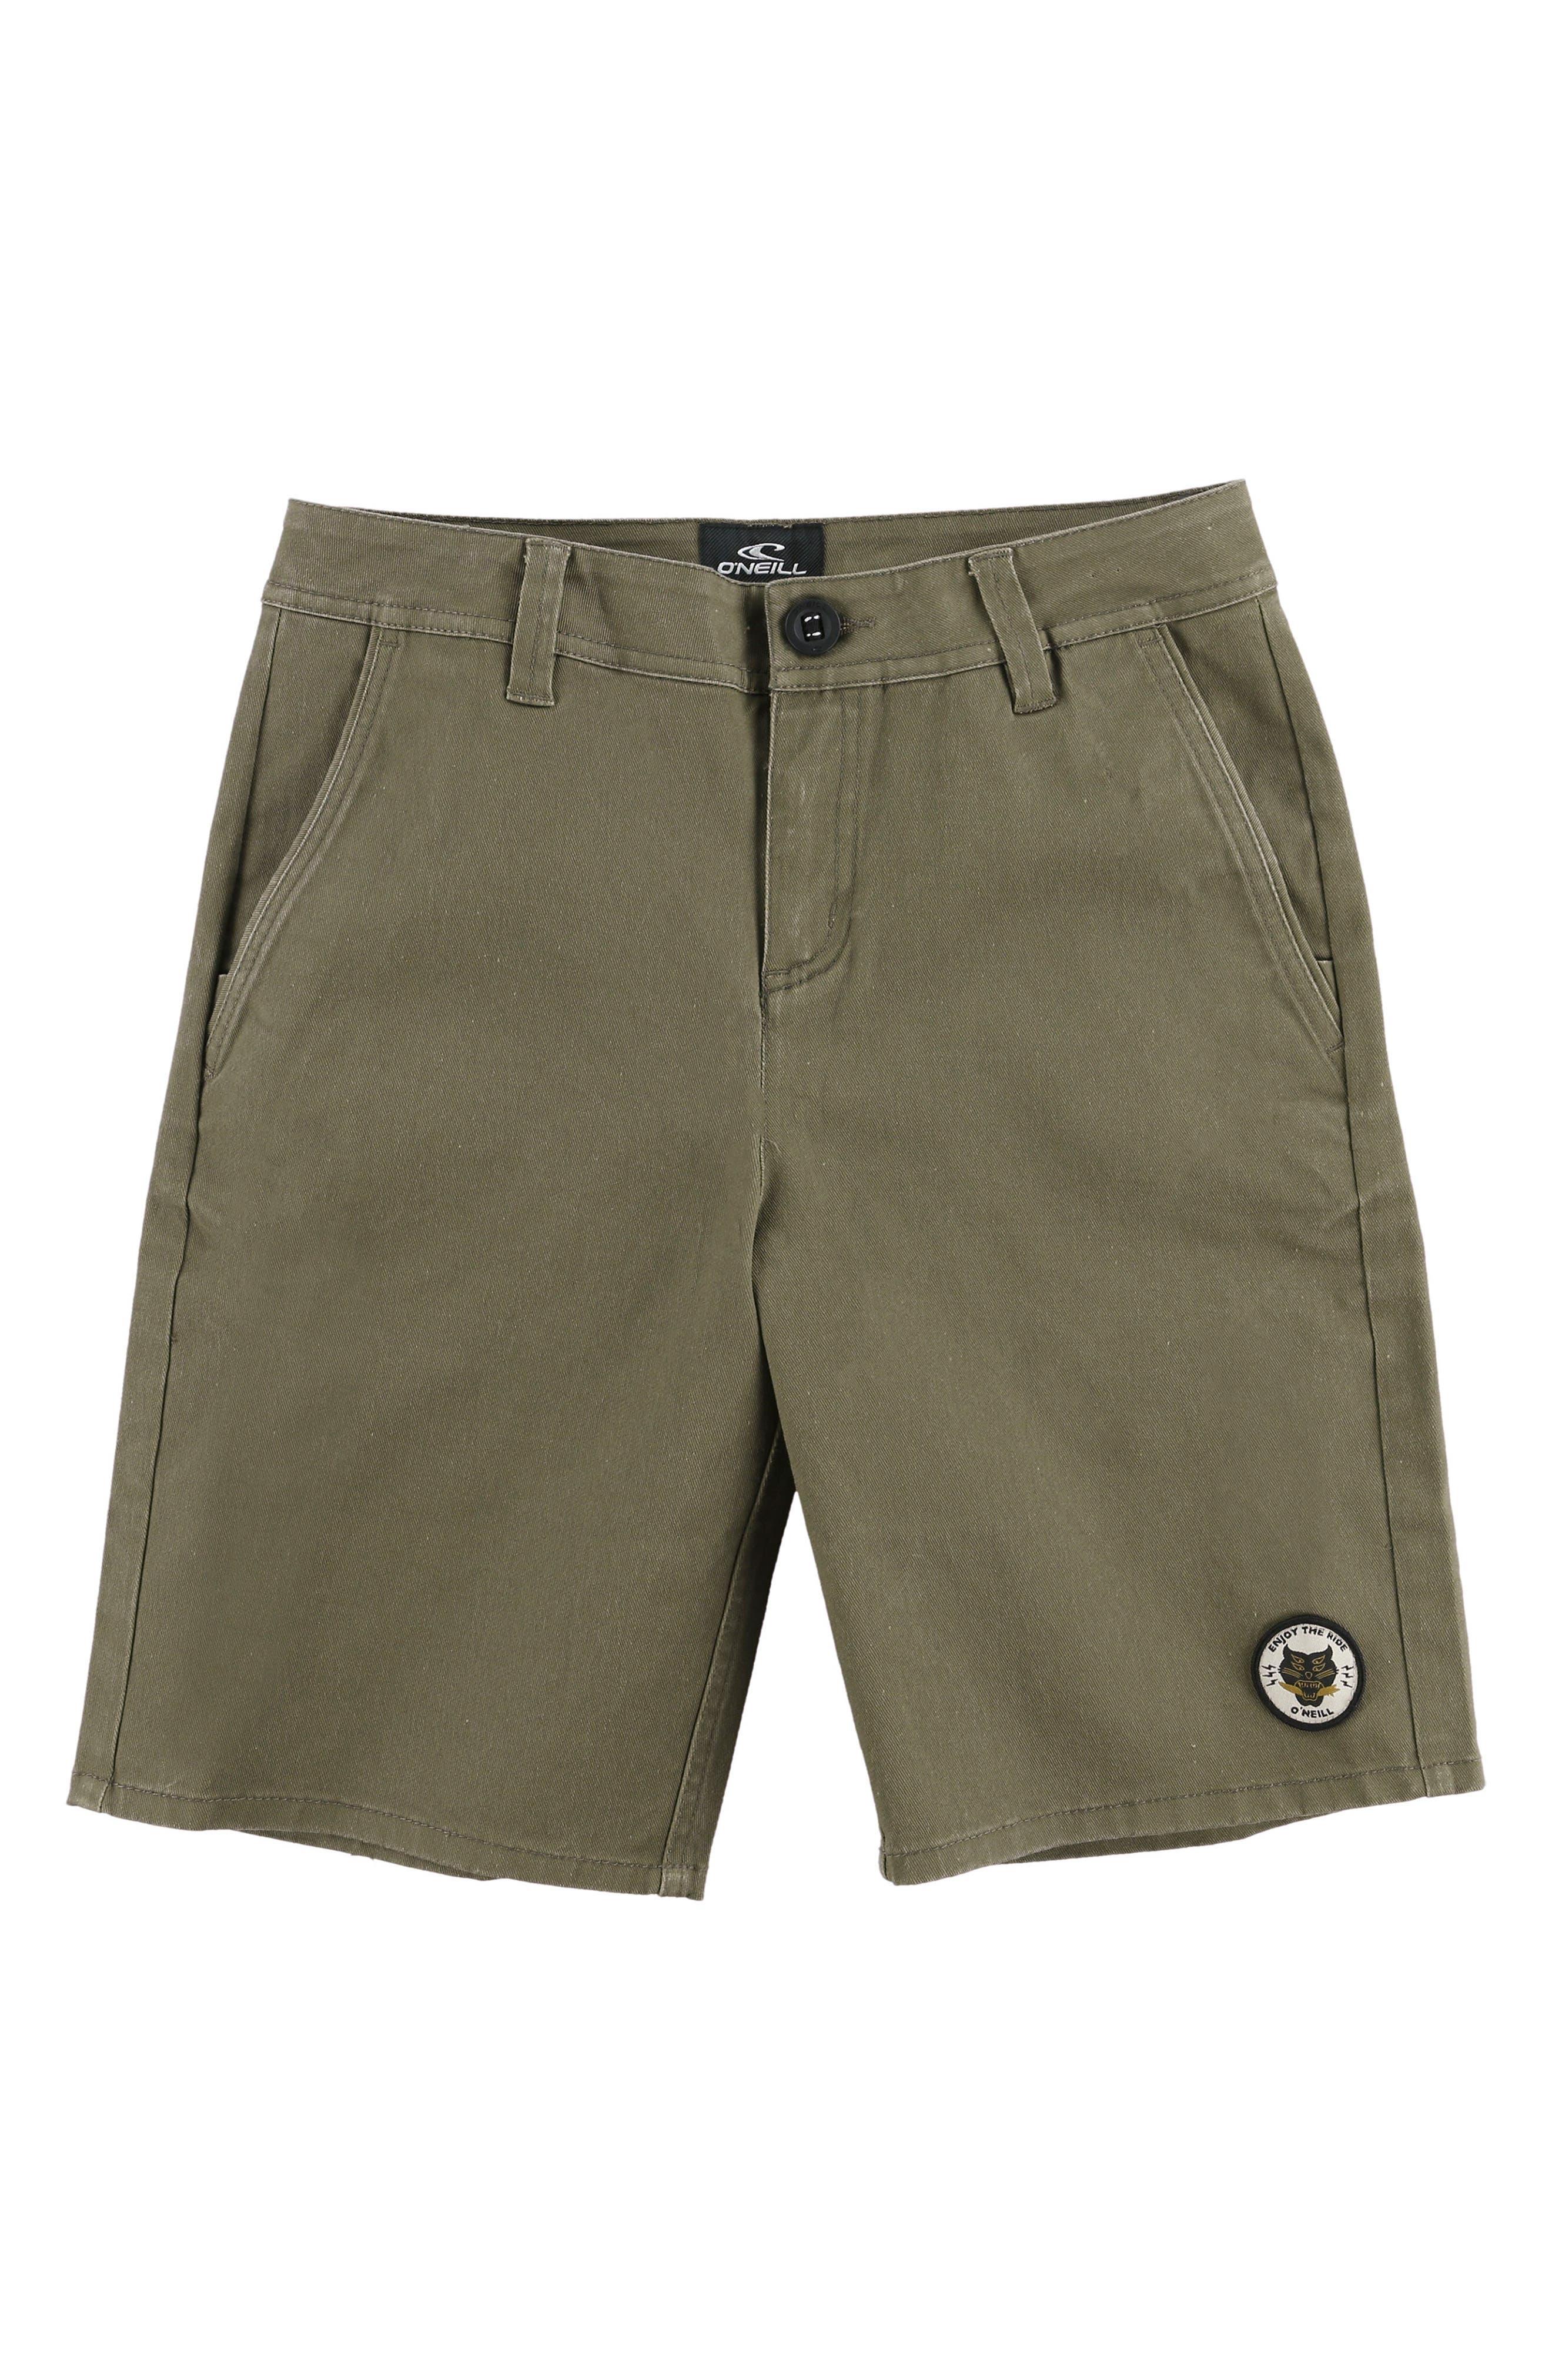 Rialto Shorts,                         Main,                         color, Dark Army